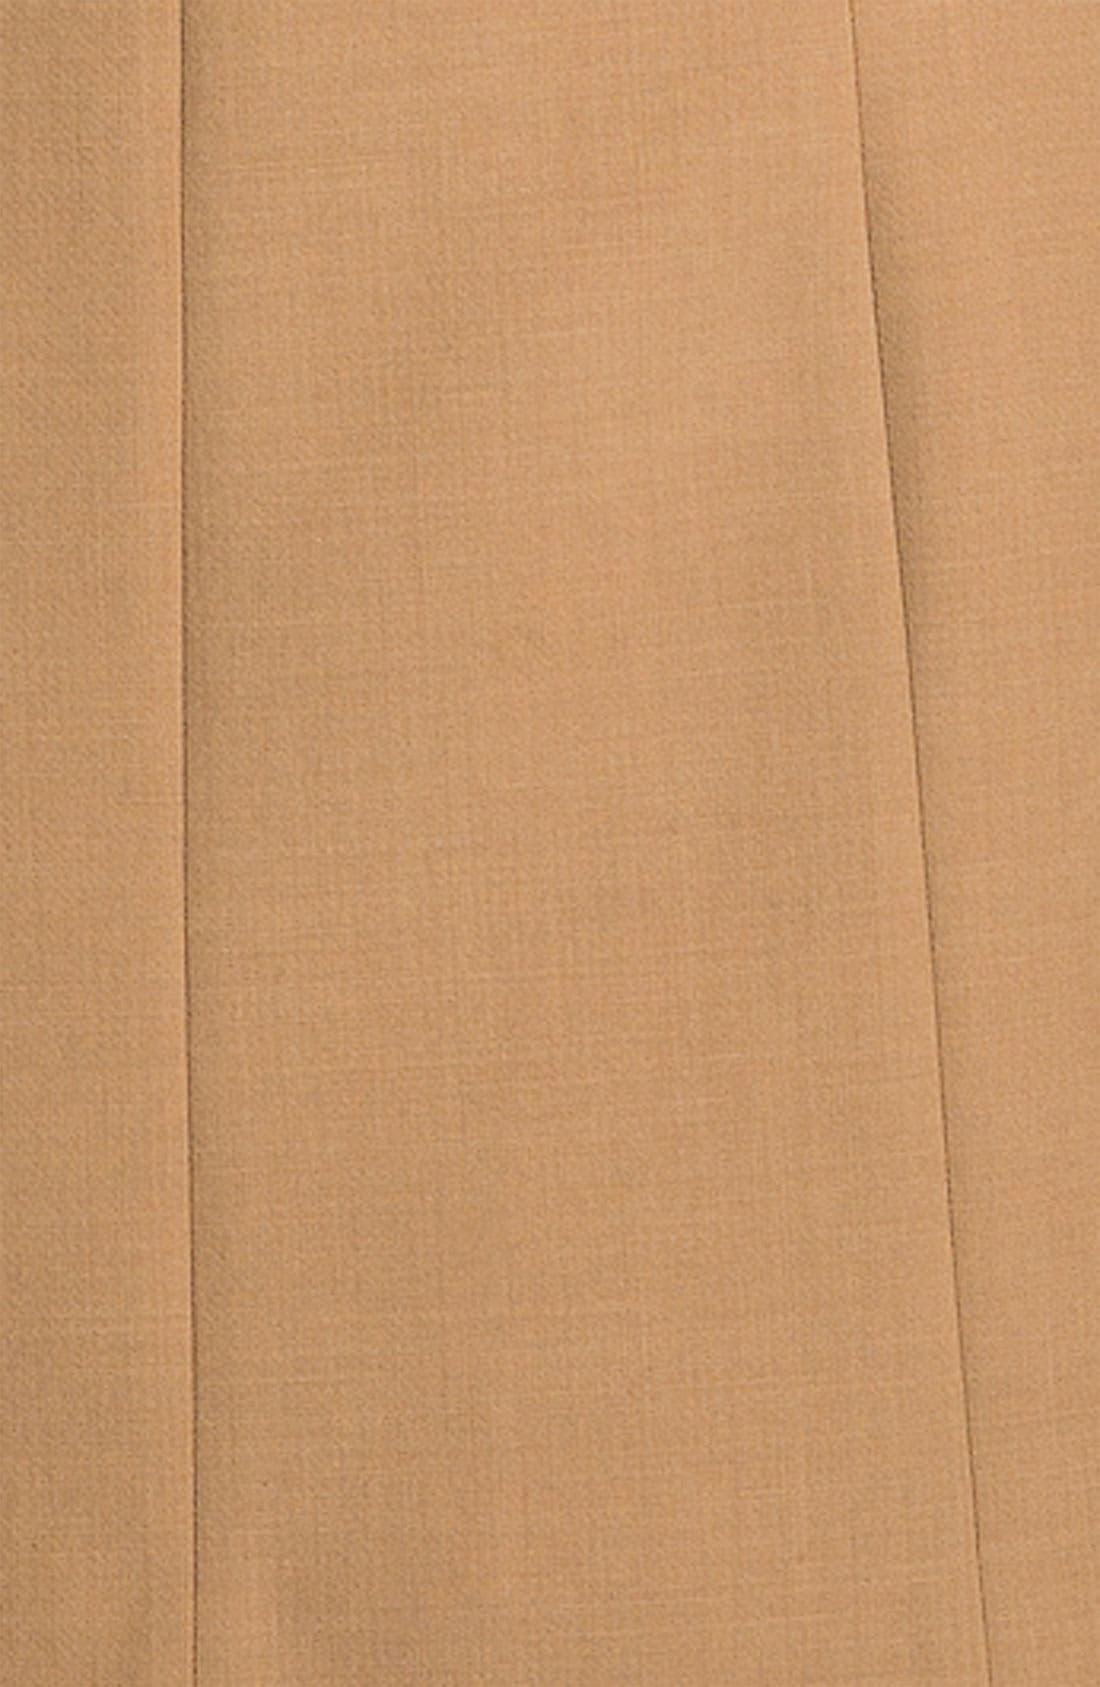 Alternate Image 3  - Tory Burch 'Azalea' Stretch Wool Sheath Dress